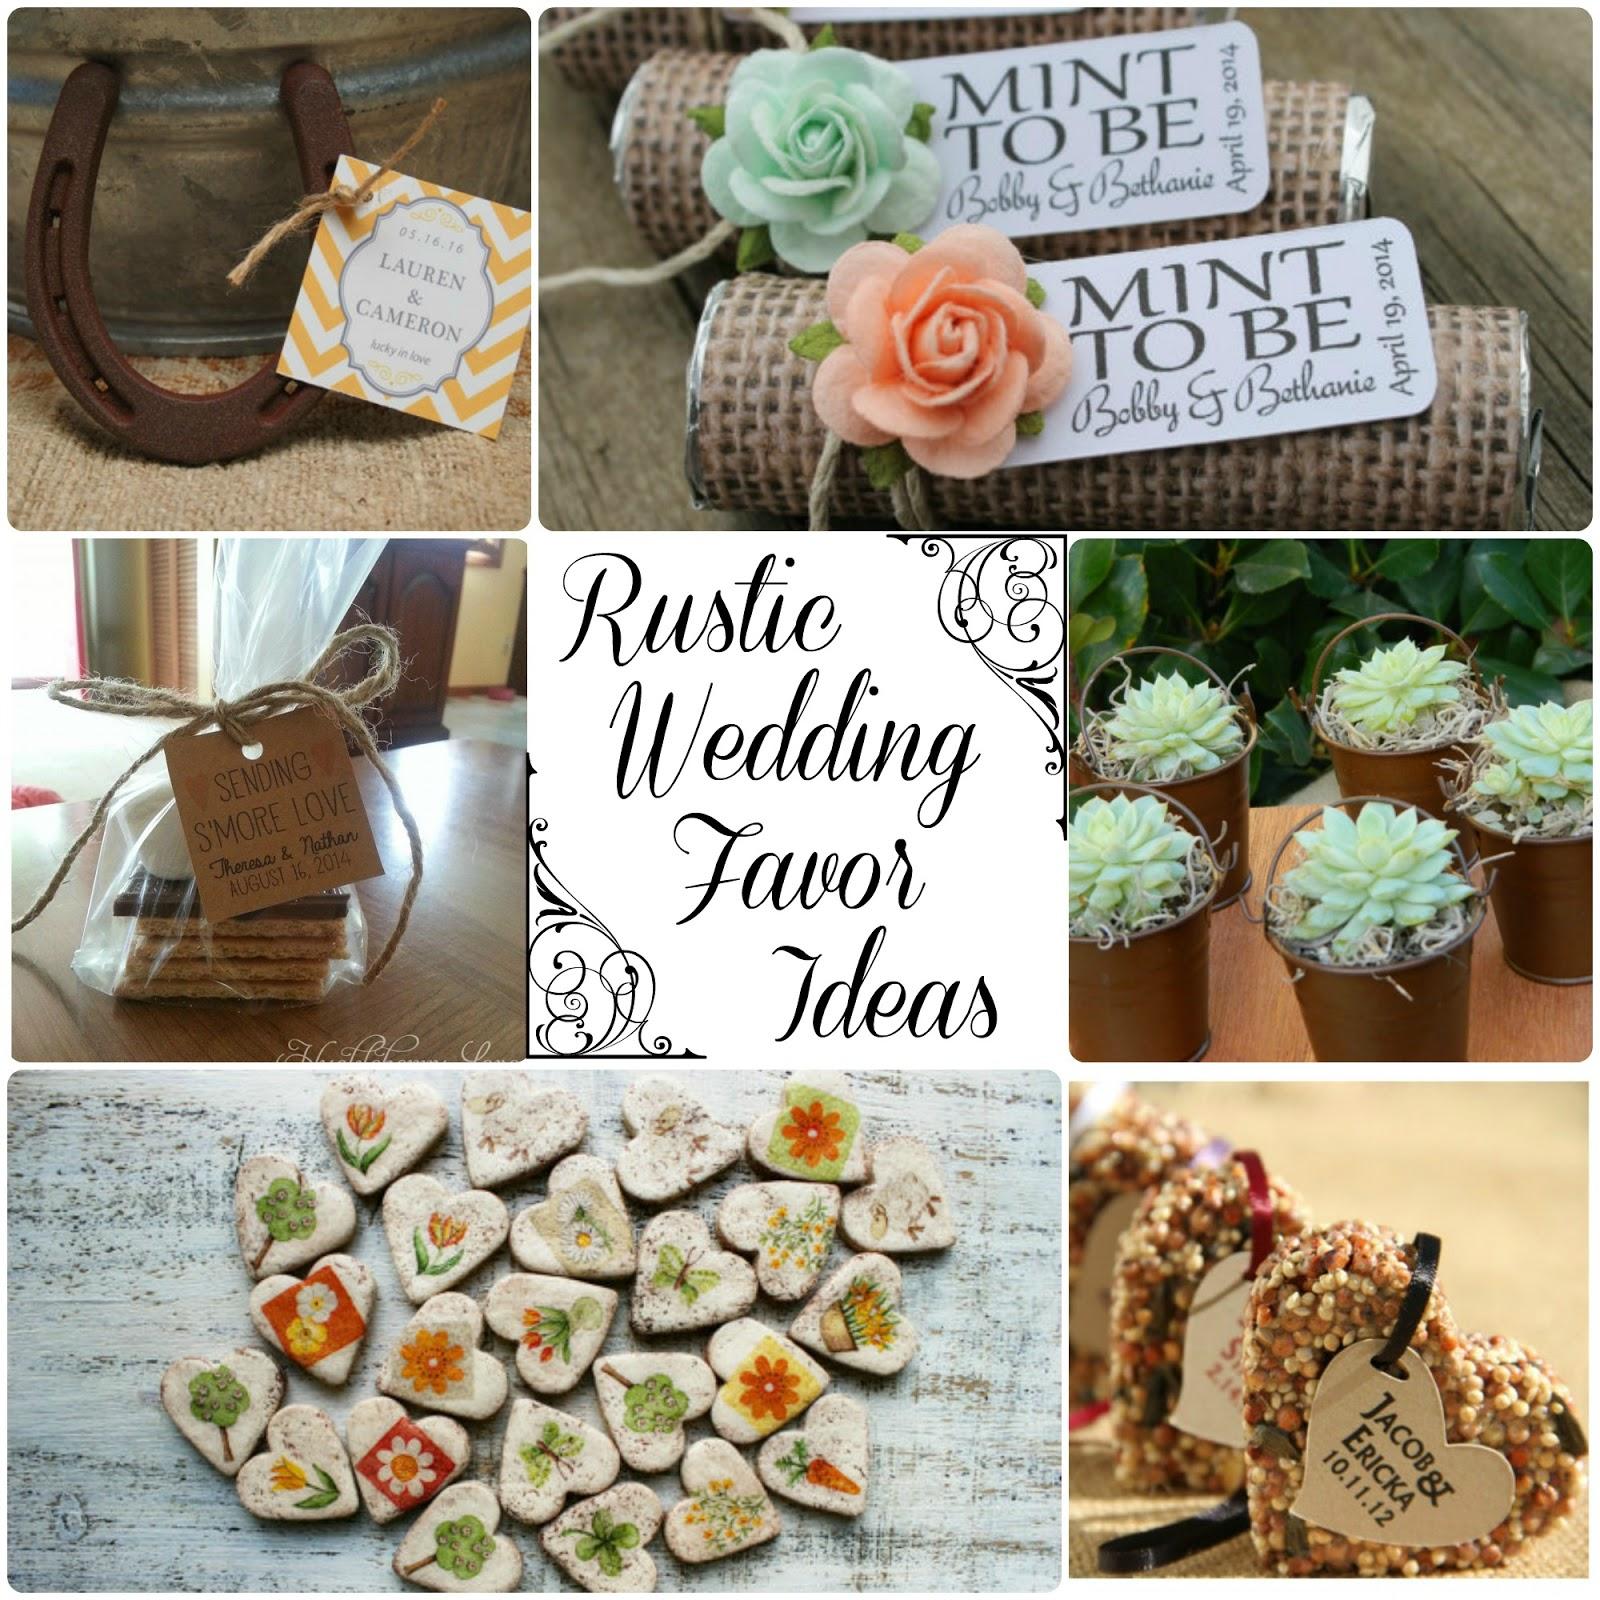 rustic wedding favor ideas round up wedding favor ideas